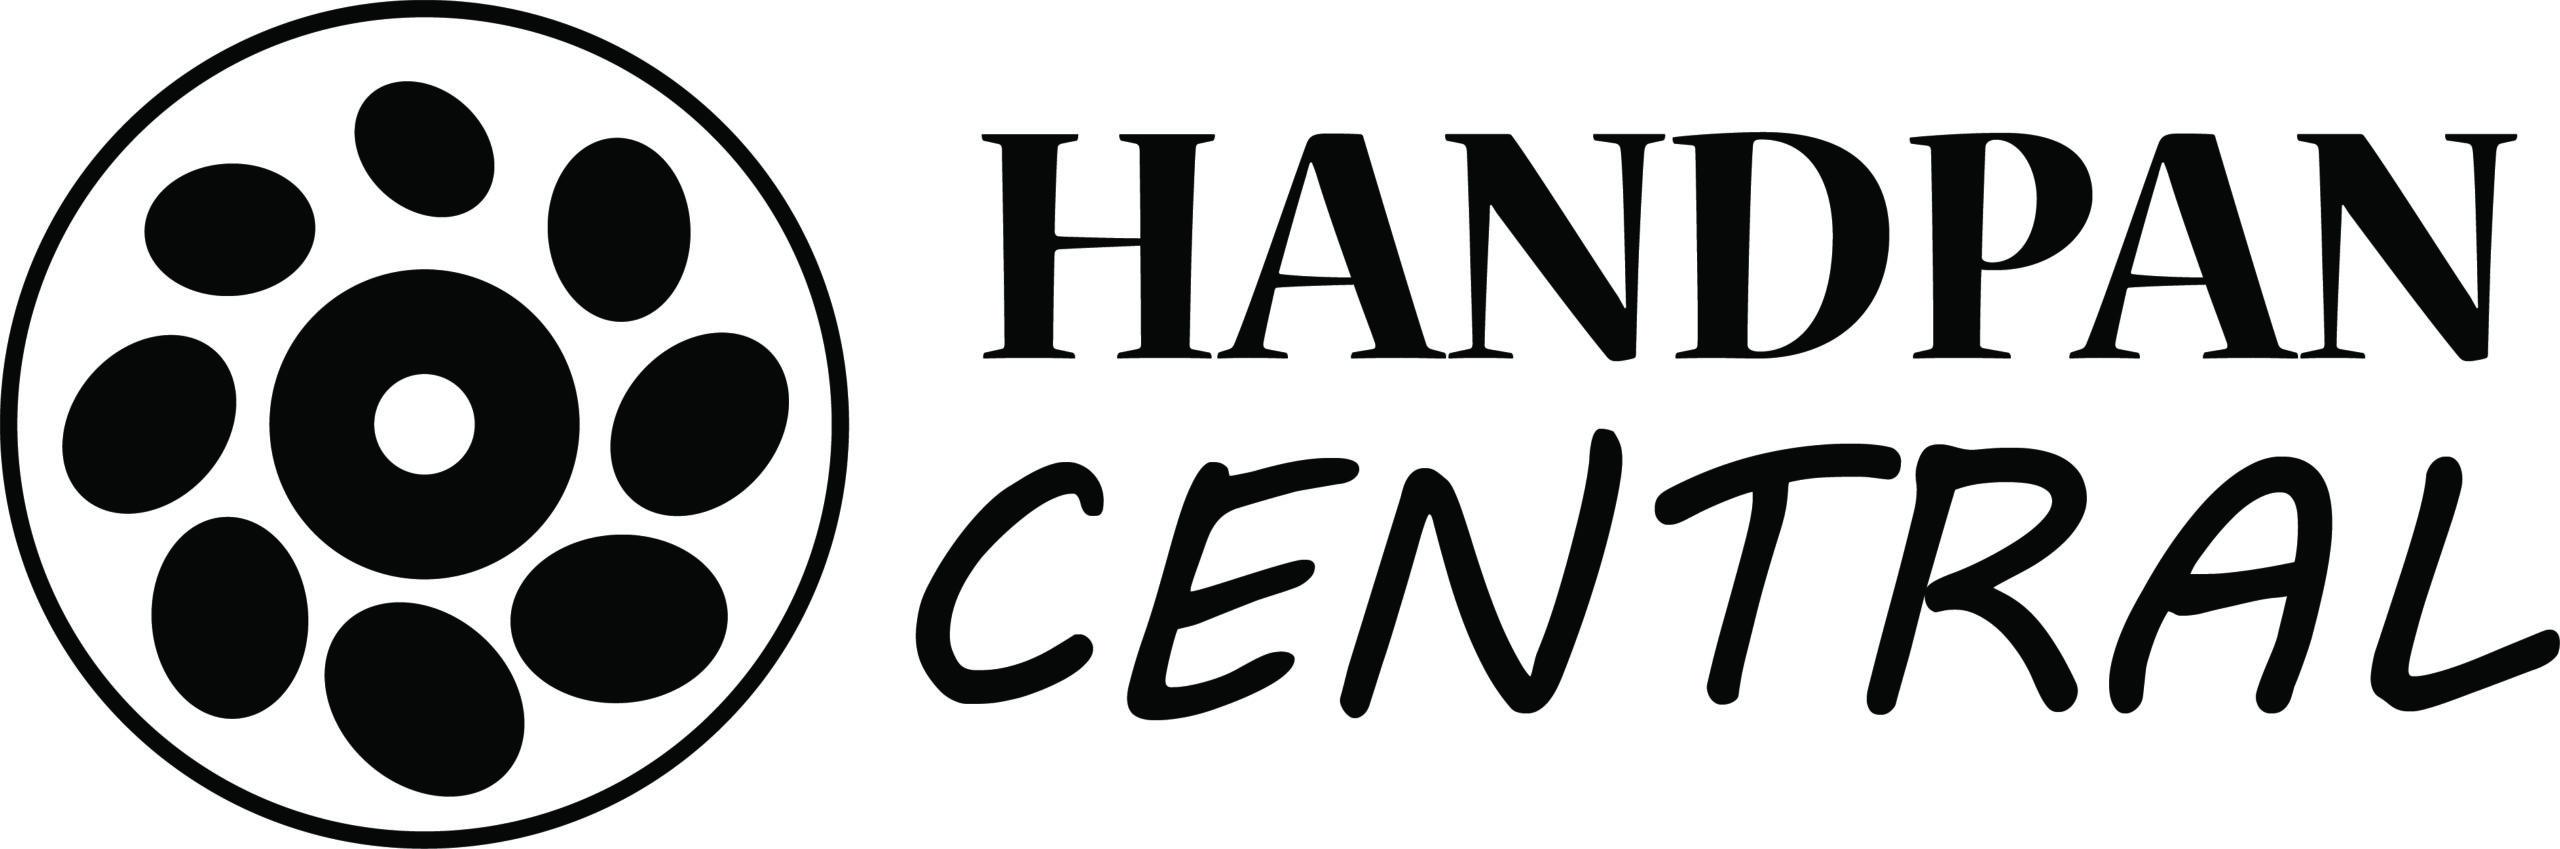 Handpan Central